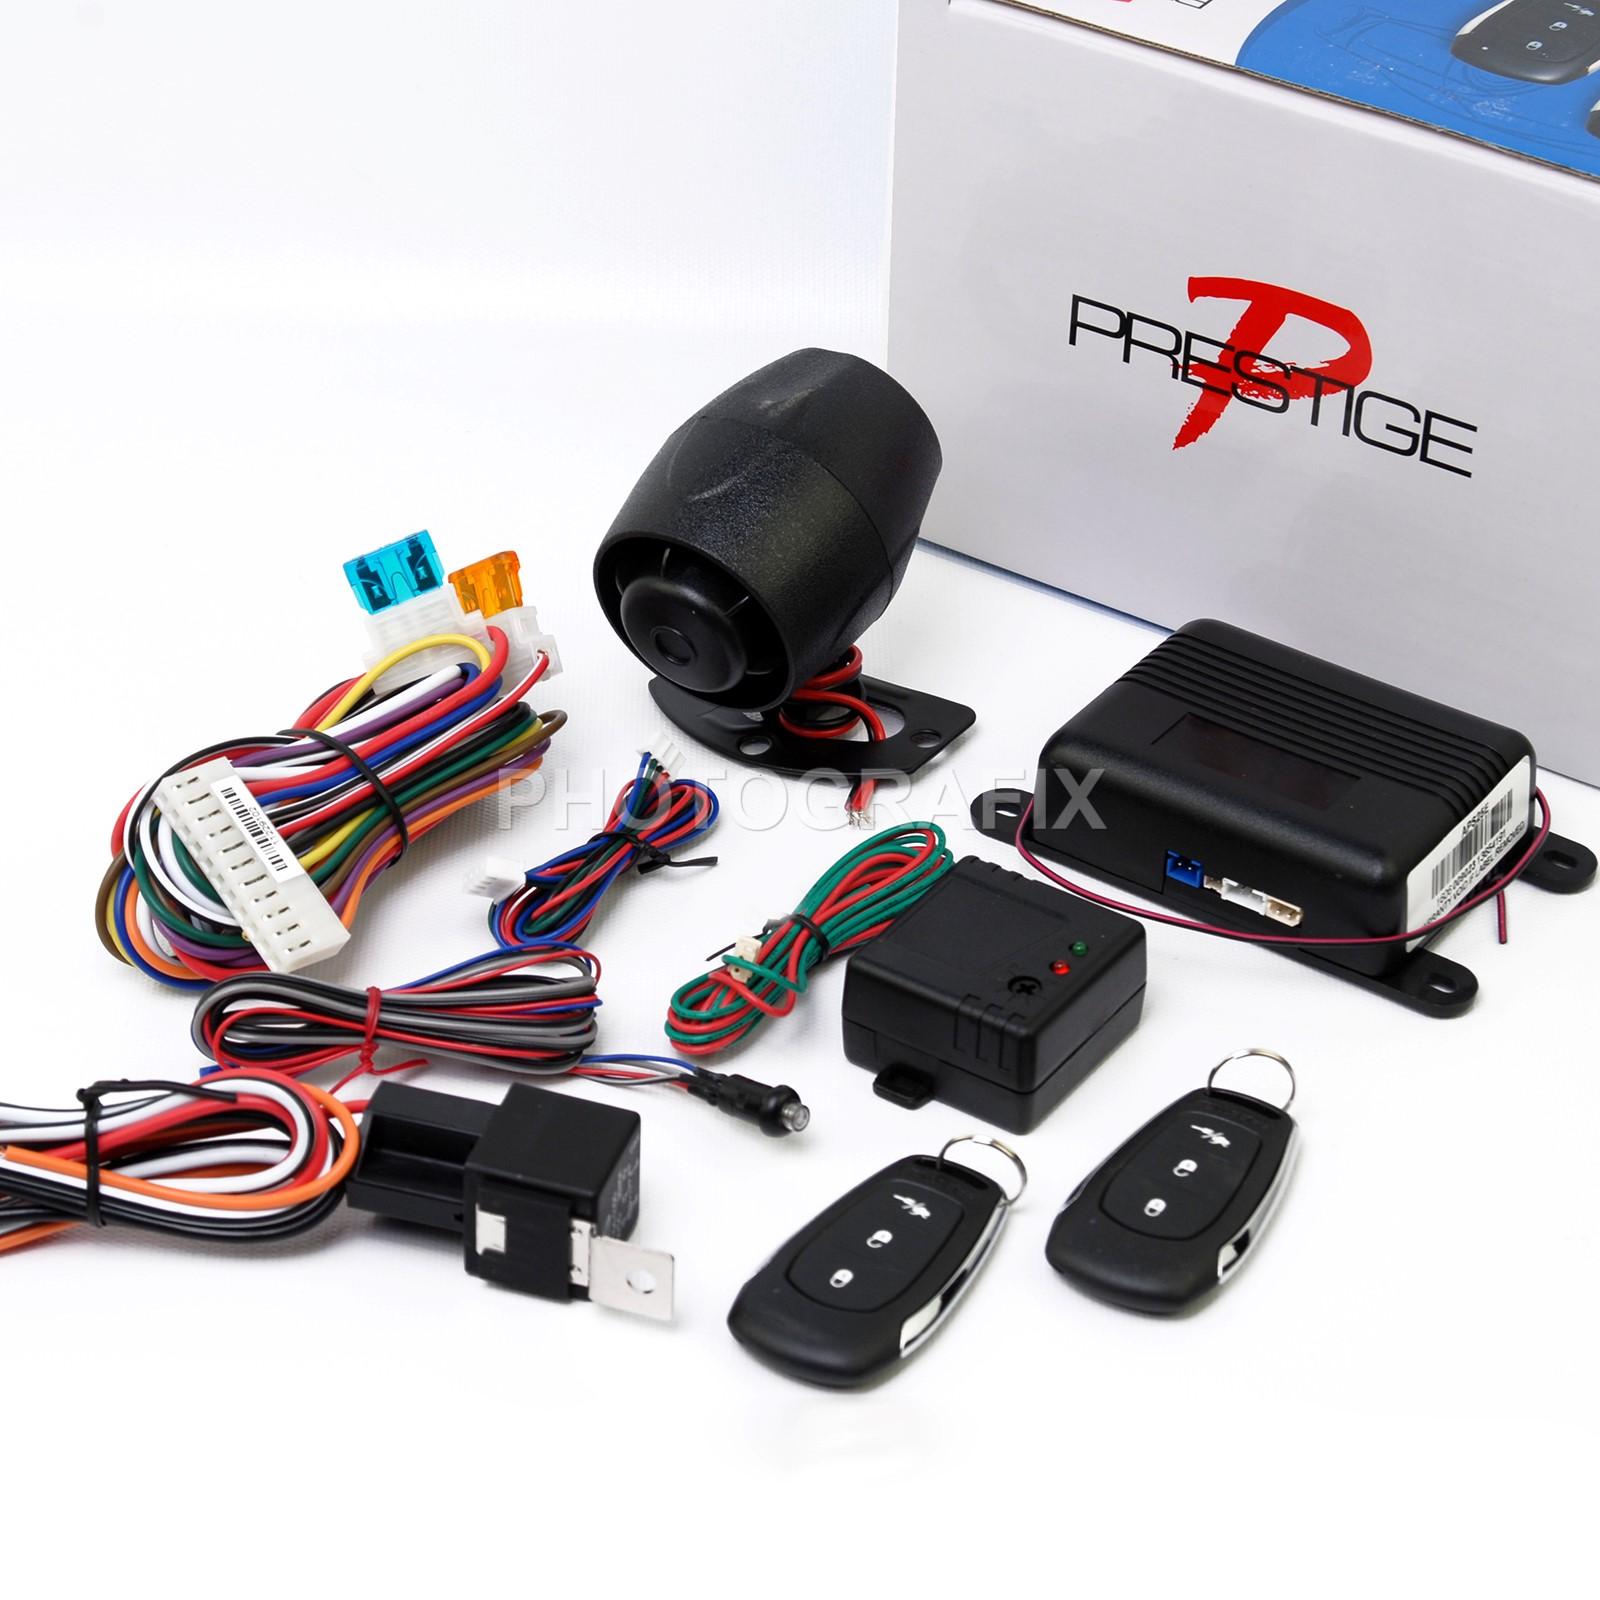 hight resolution of  audiovox wiring diagram audiovox prestige aps25e remote car alarm system shock